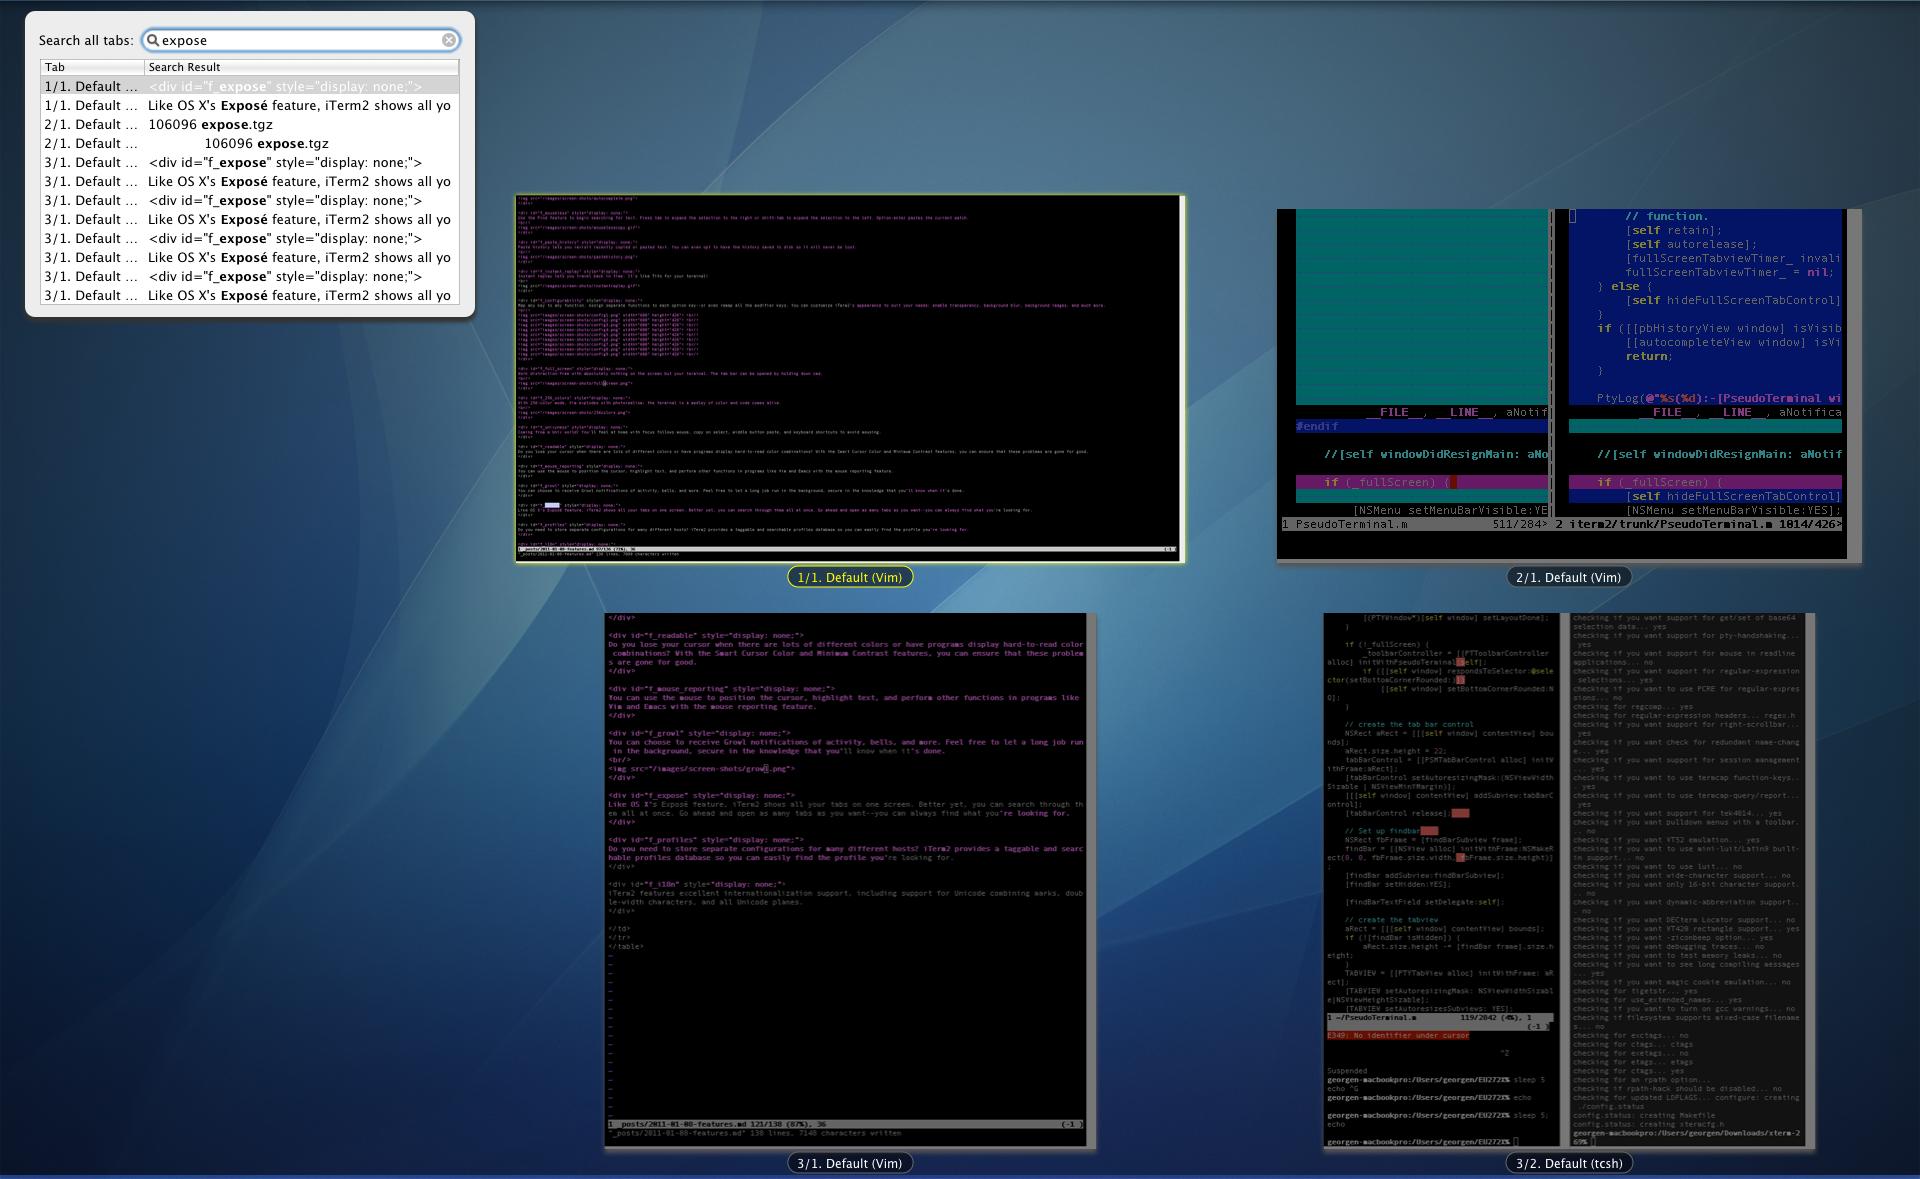 Free windows vt100 terminal emulator   6 of the Best Terminal